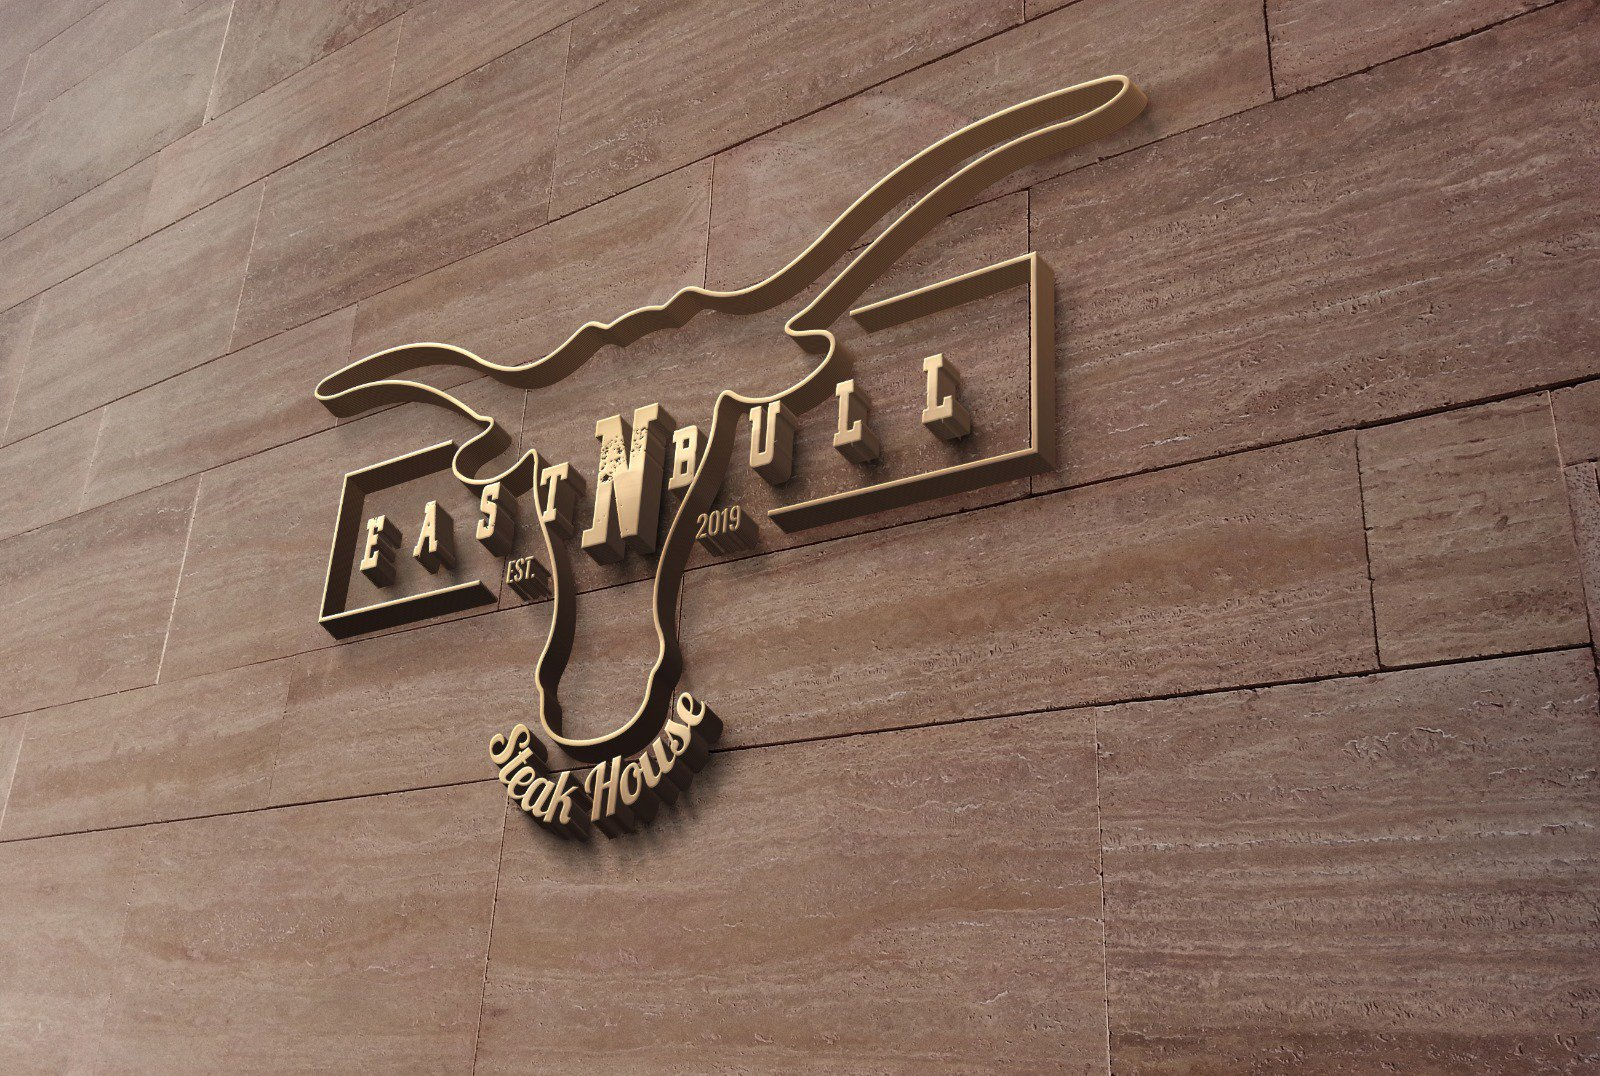 Belçika East N Bull Steak House